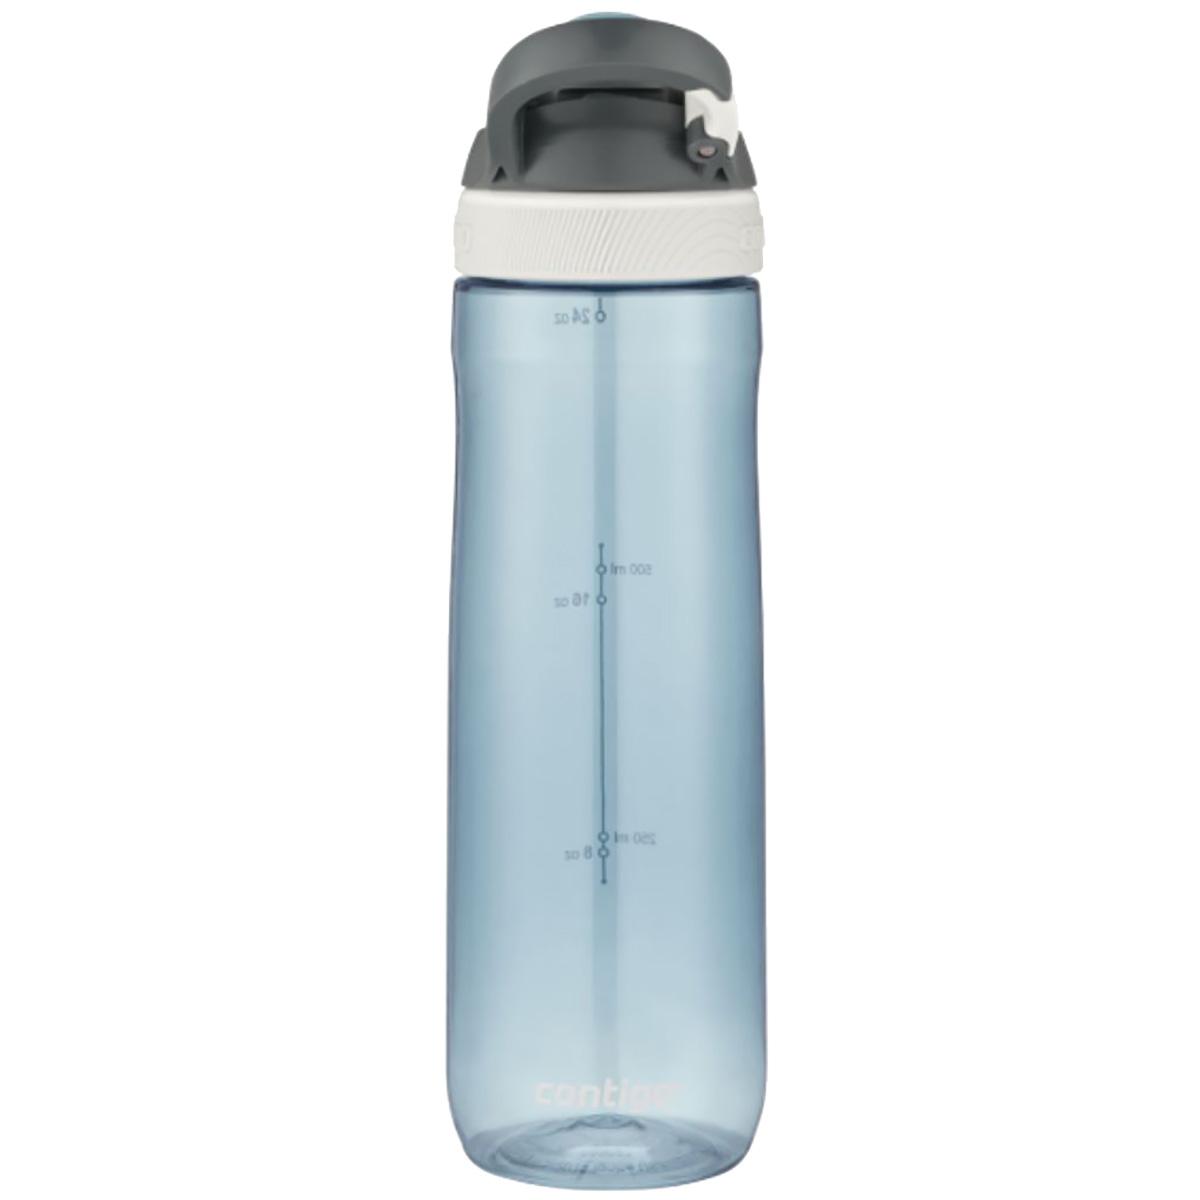 Contigo-24-oz-Chug-Autospout-Leak-Proof-Water-Bottle miniatuur 21